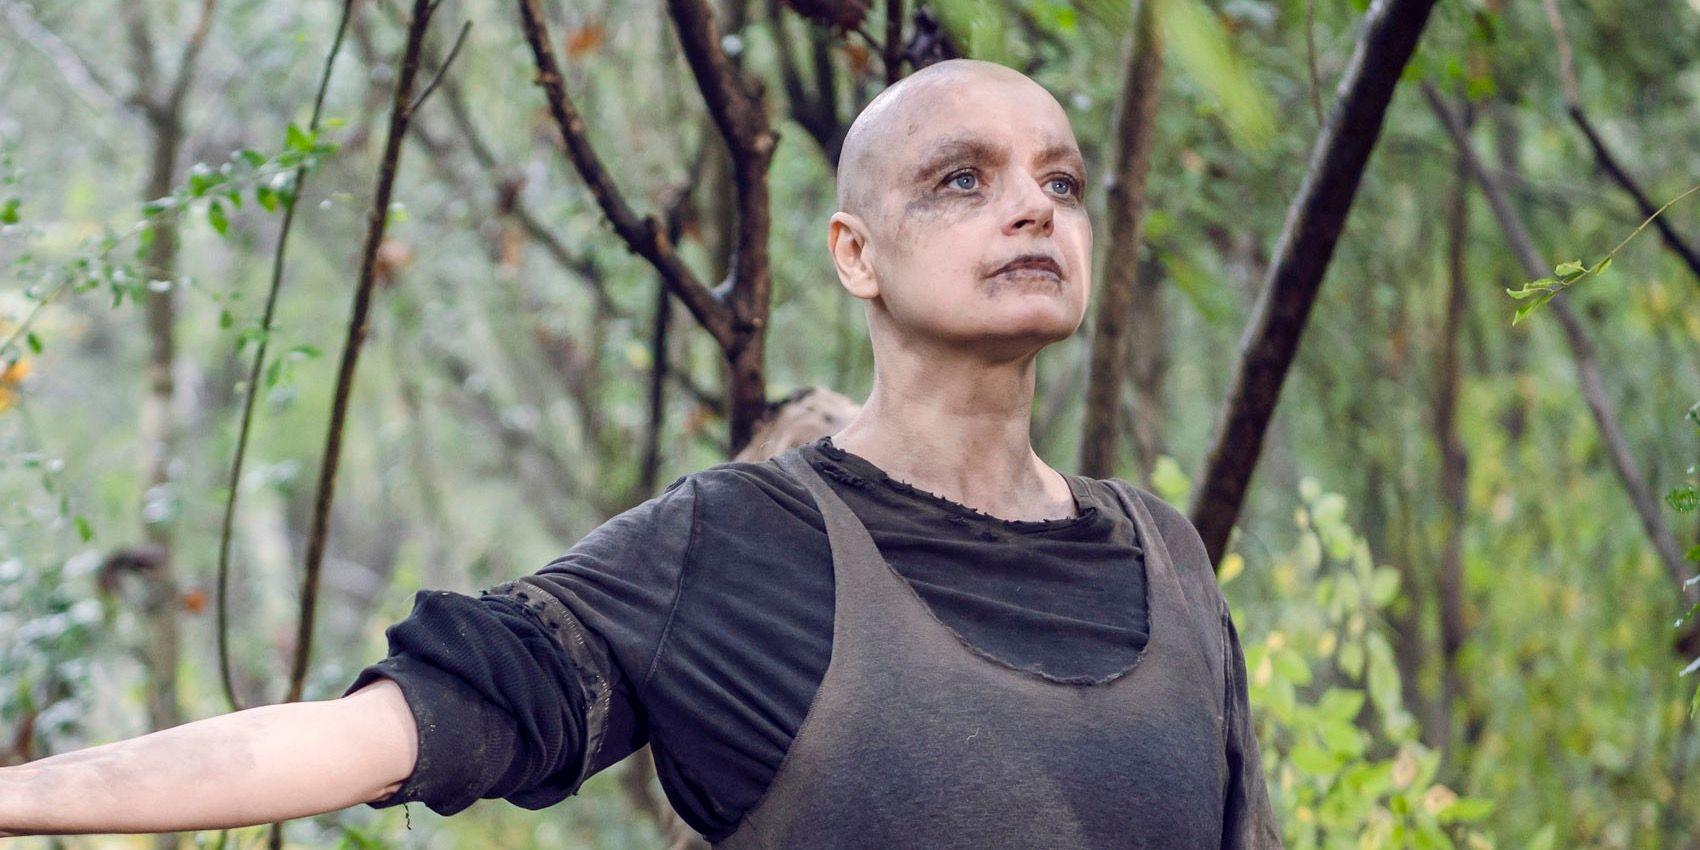 Walking Dead Season 10 Promo Teases End of the World